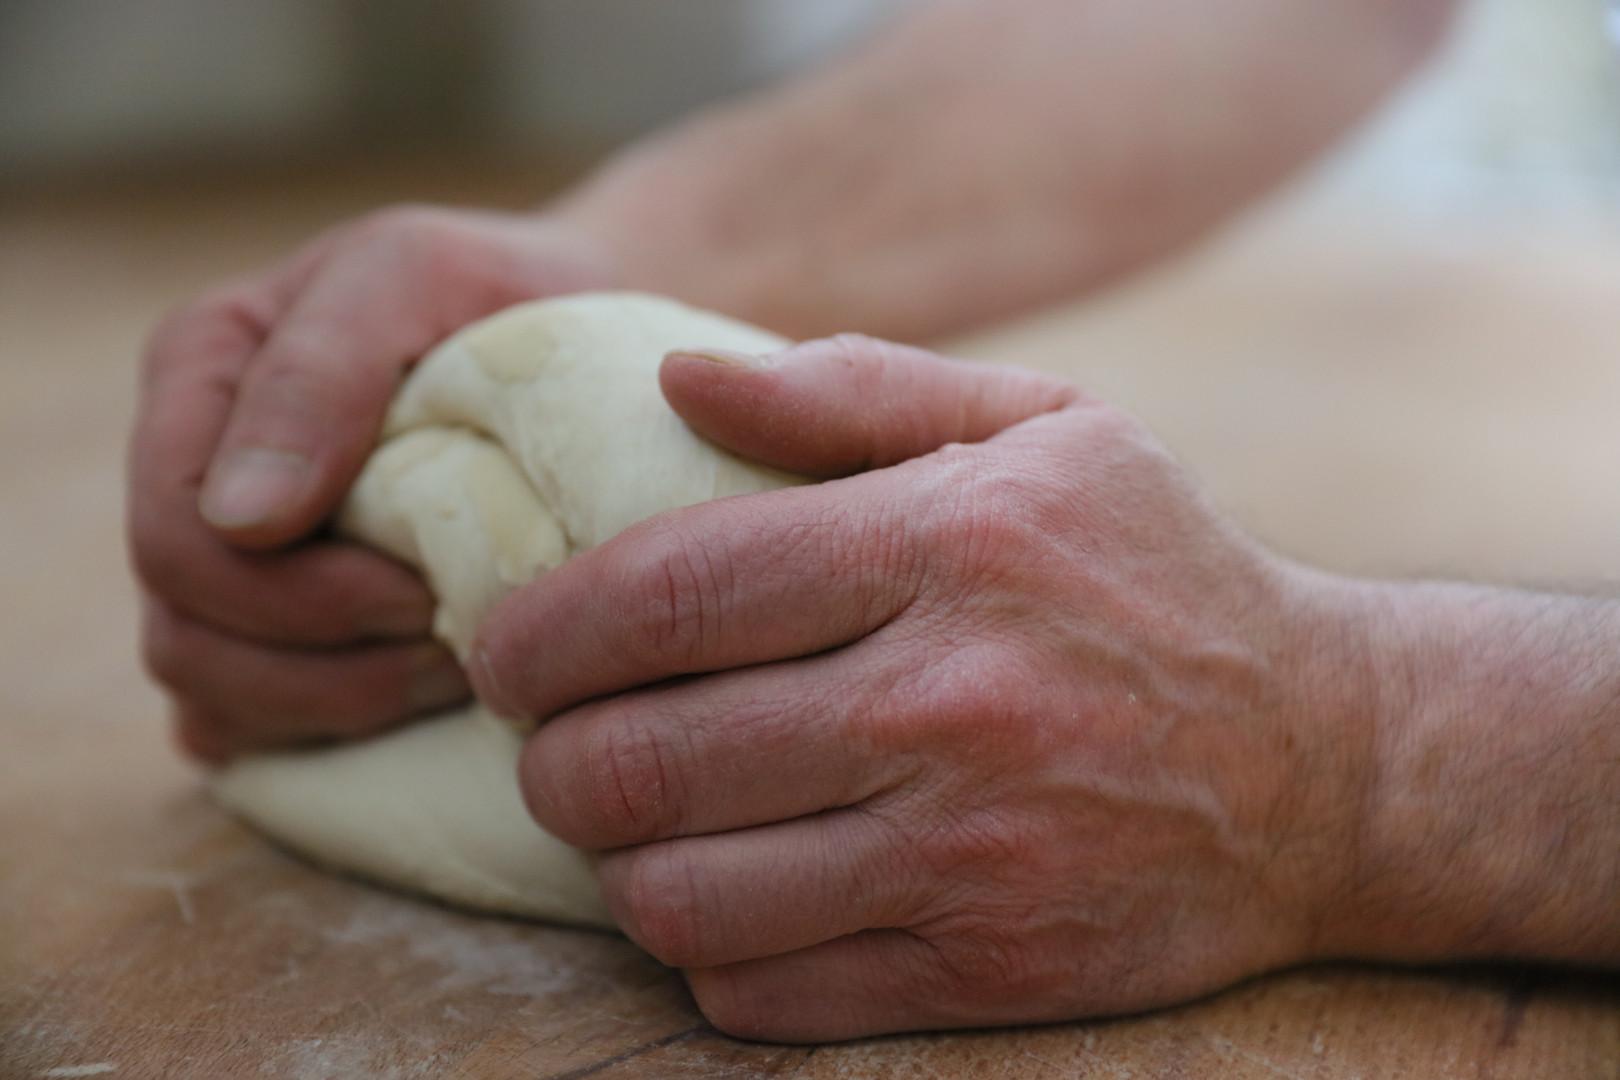 patisserie-clerc-artisant